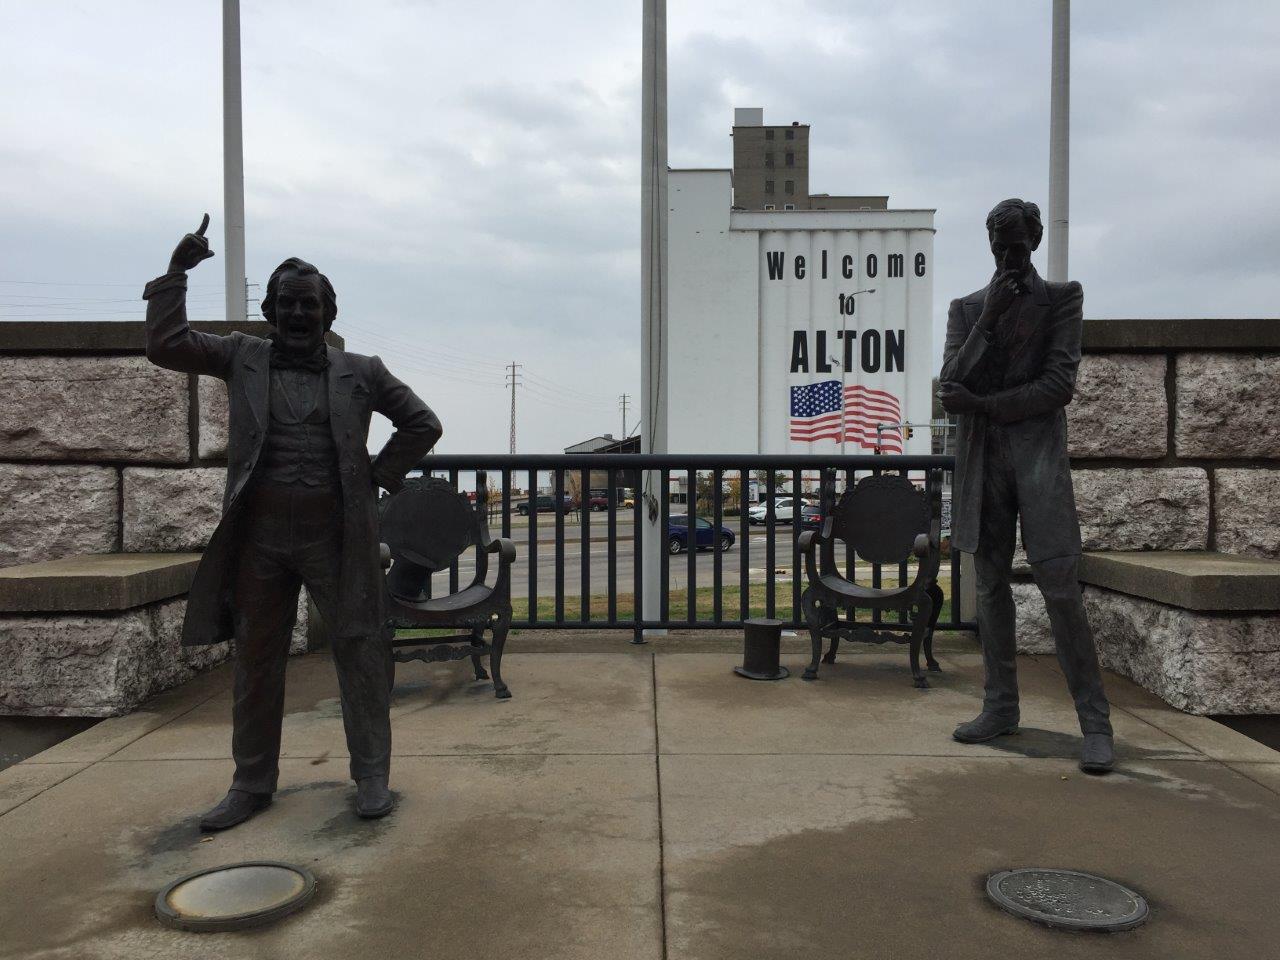 Lincoln-Douglas statue at site of last debate